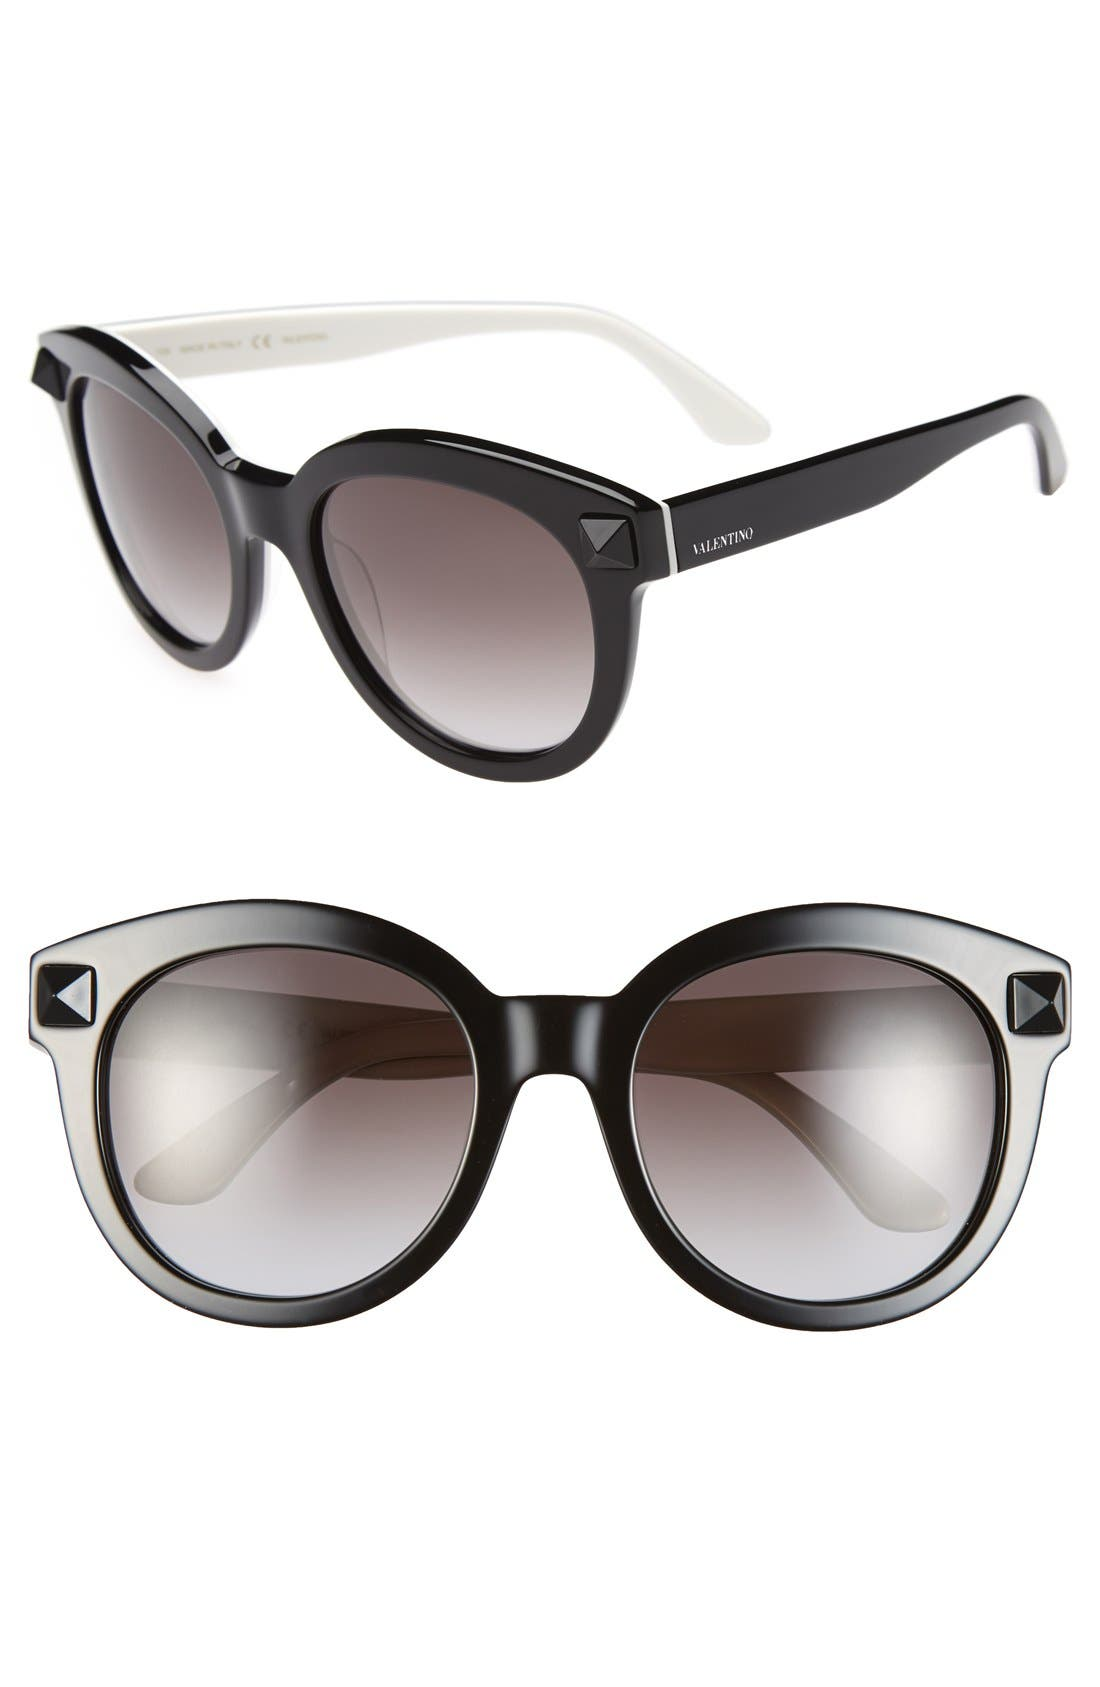 VALENTINO 'Rockstud' 54mm Semi Oval Cat Eye Sunglasses, Main, color, 015